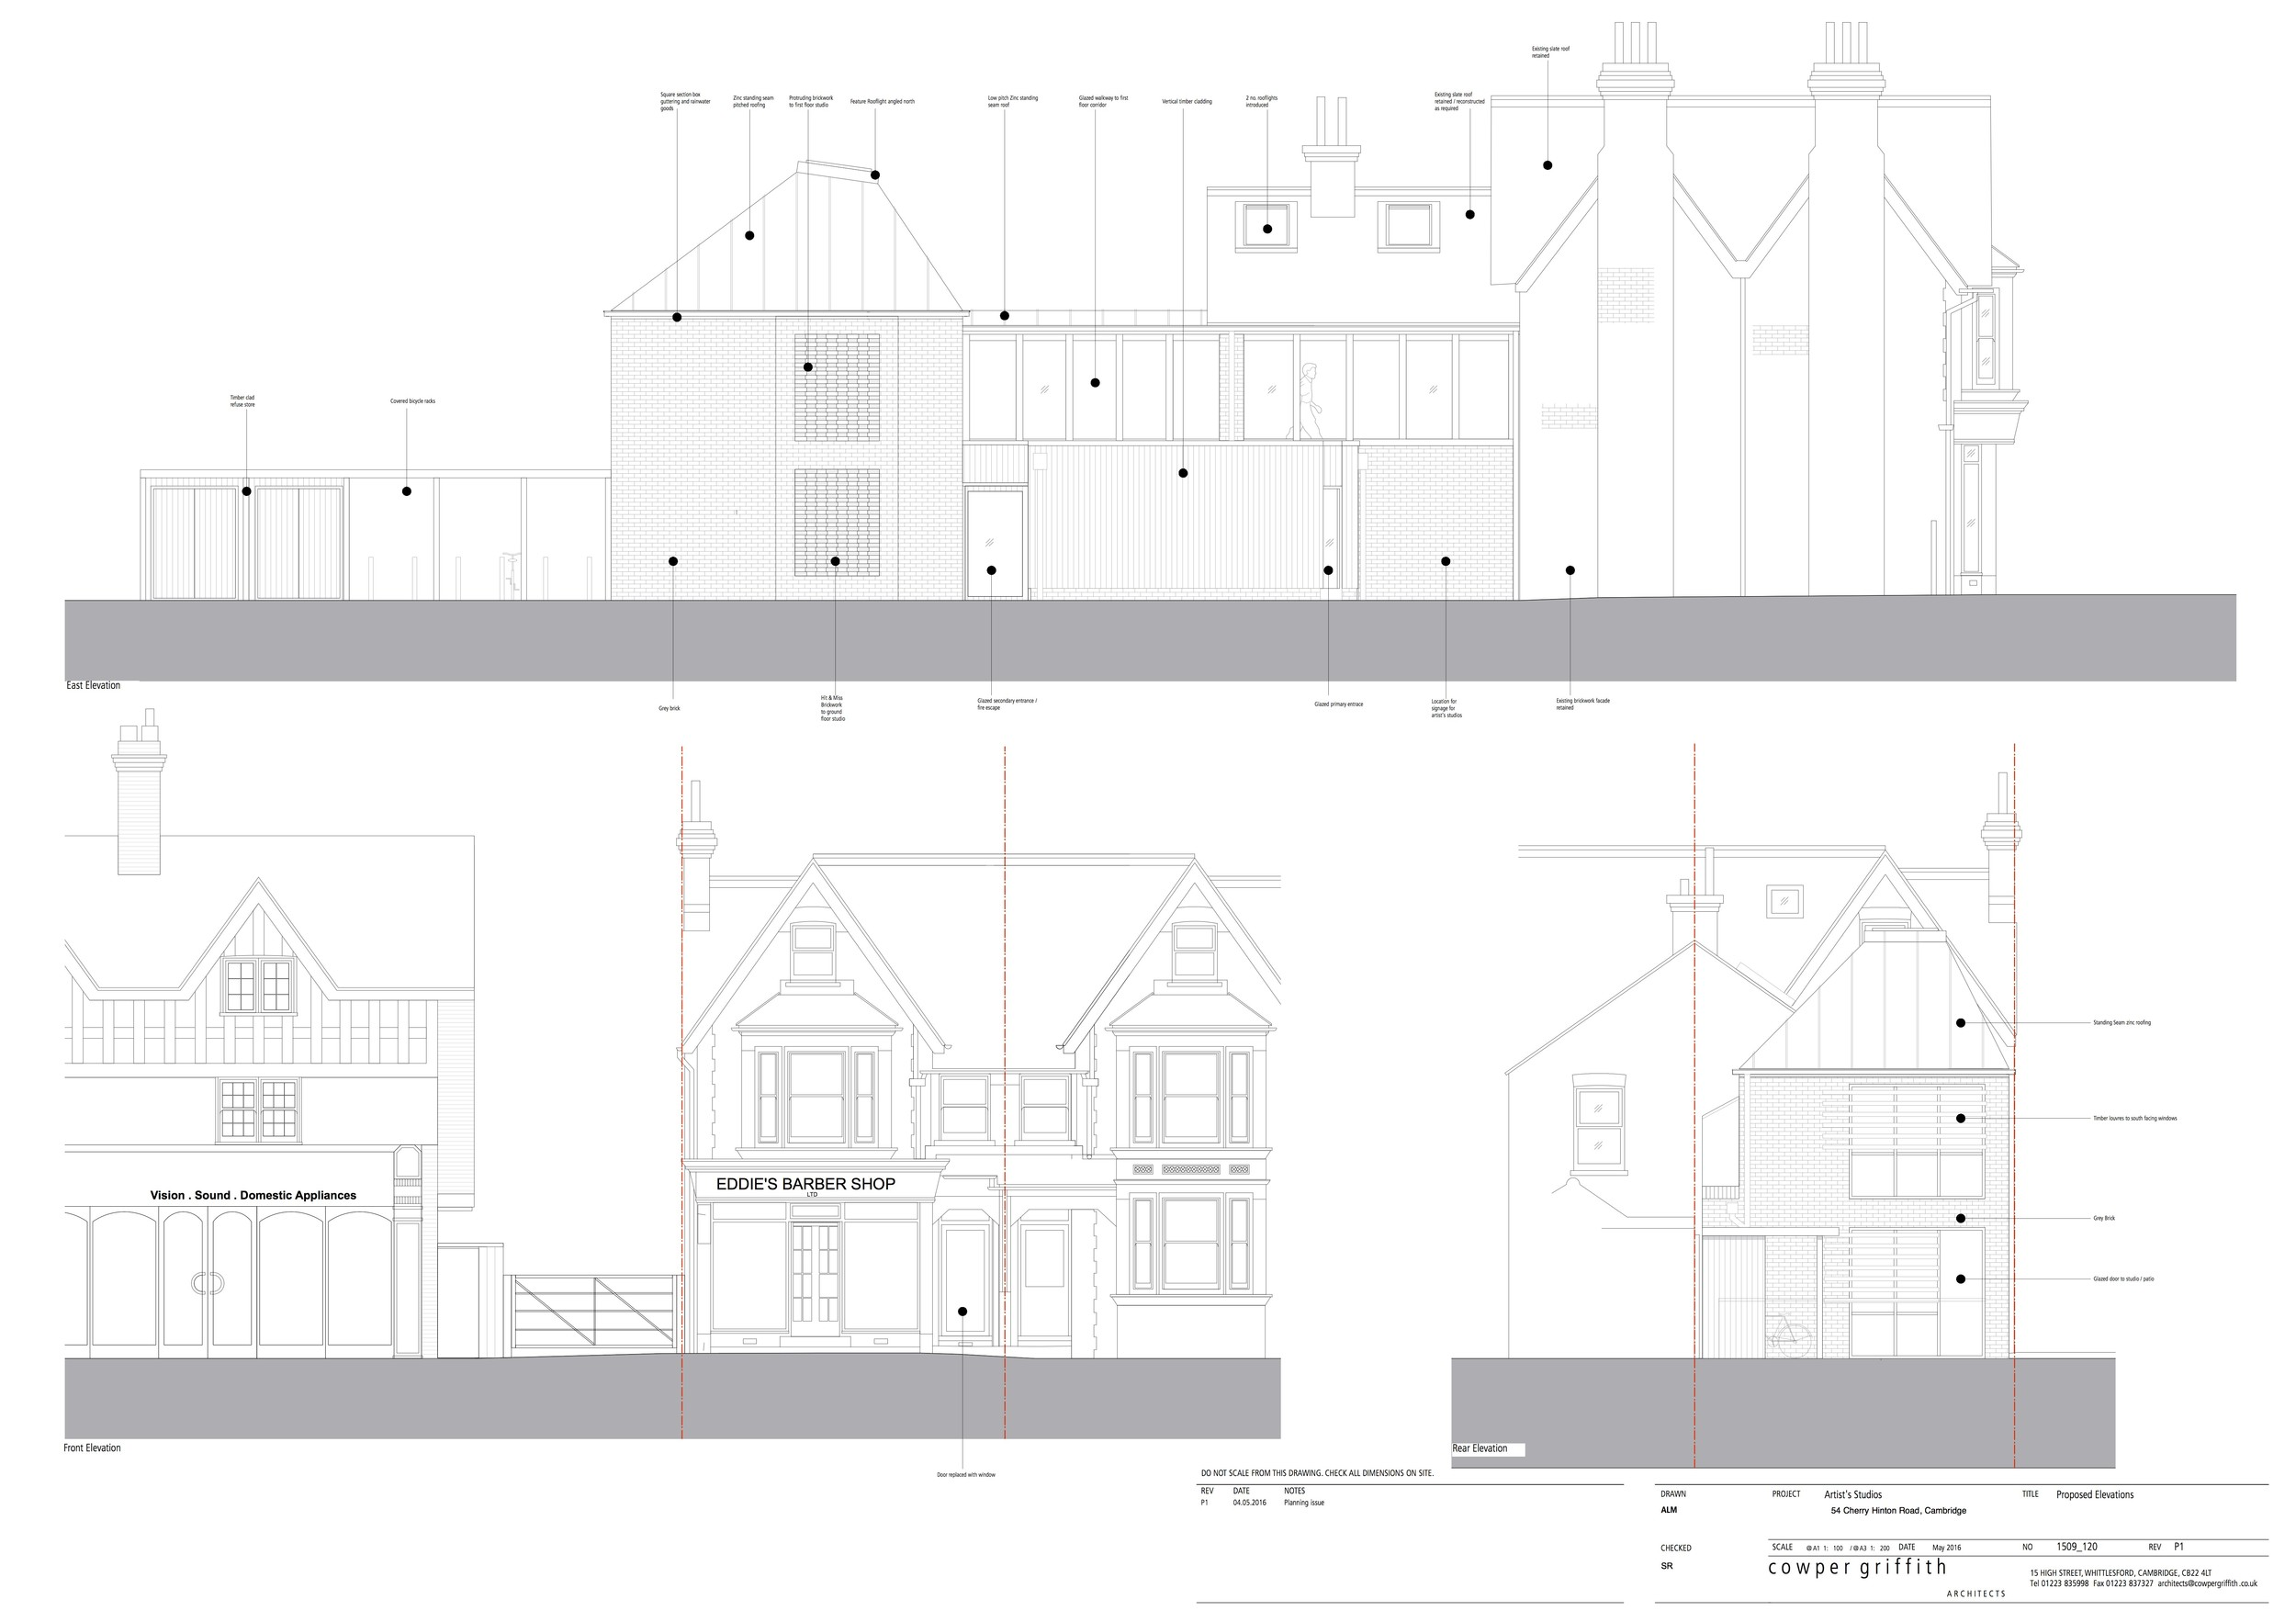 1509_120 - Proposed Elevations.jpg